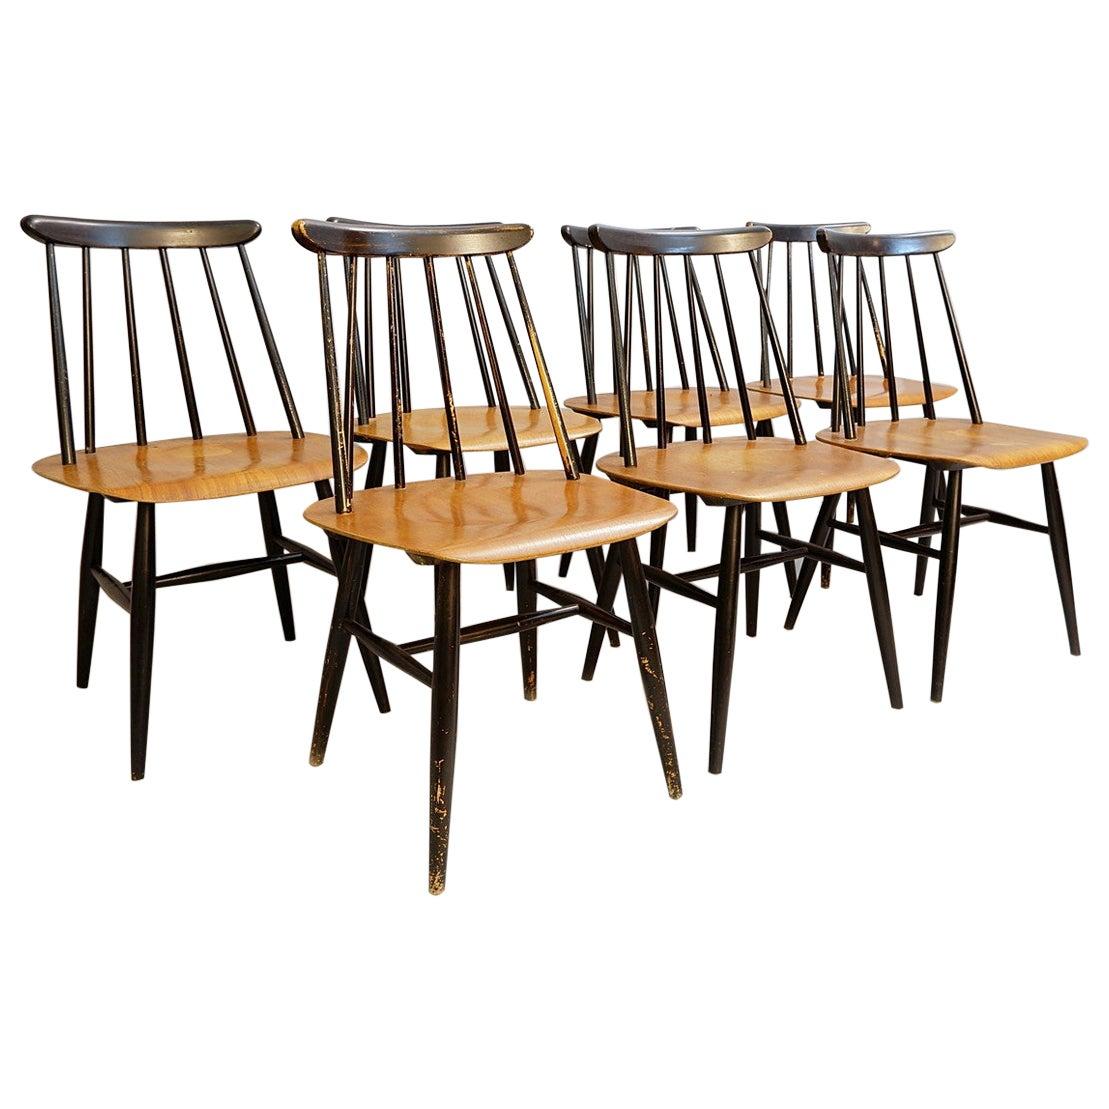 Set of 7 'Fanett' Dining Chairs by Ilmari Tapiovaara for Edsby Verken